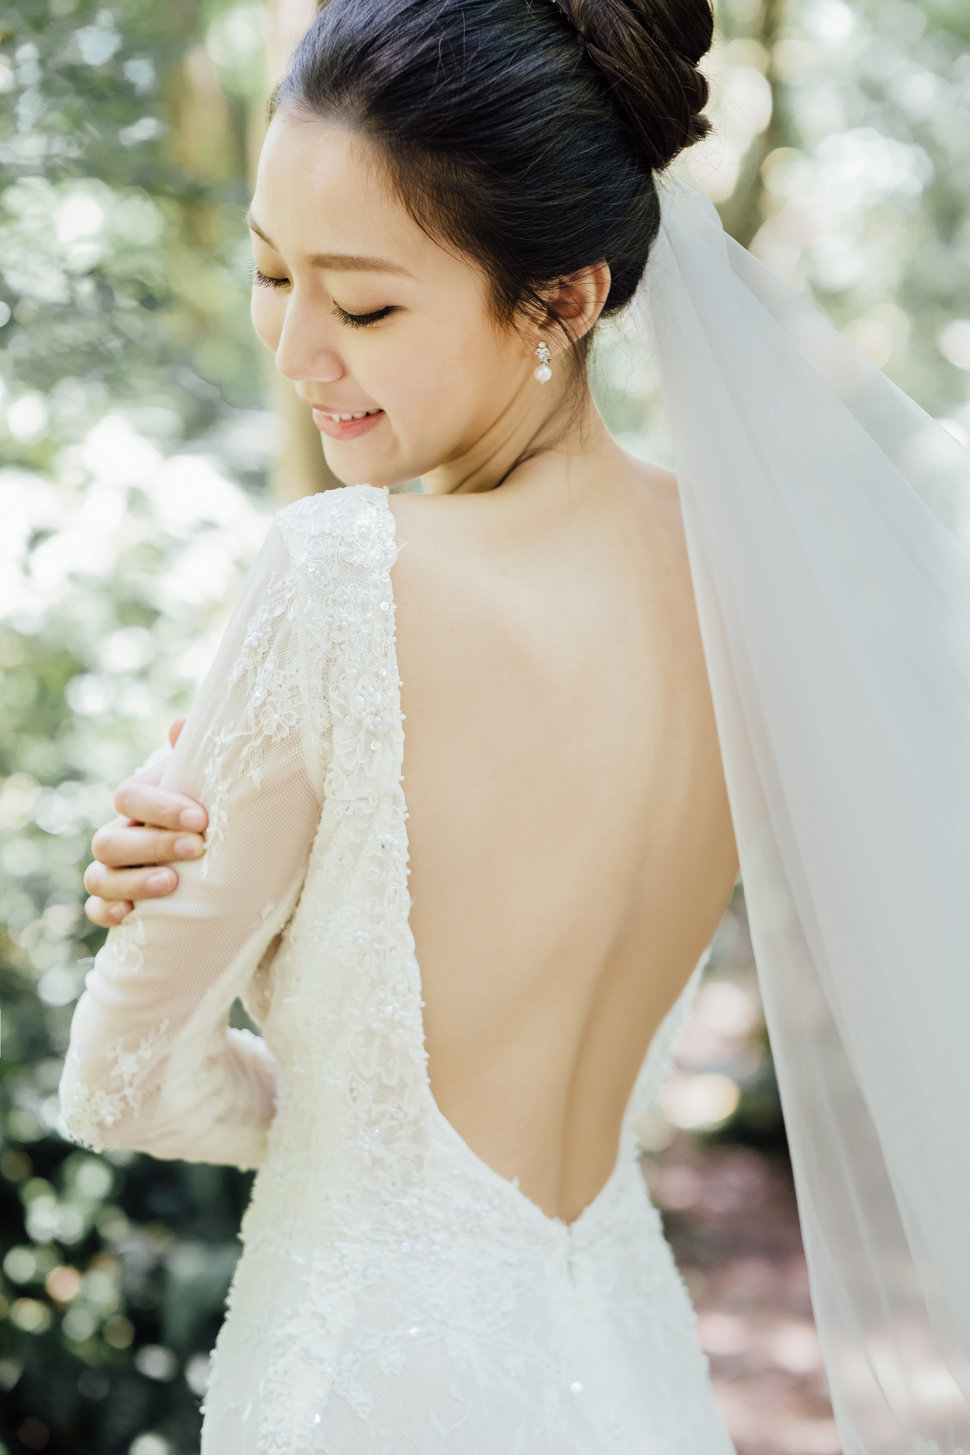 DSCF5016 - Vicky Li 新娘秘書《結婚吧》